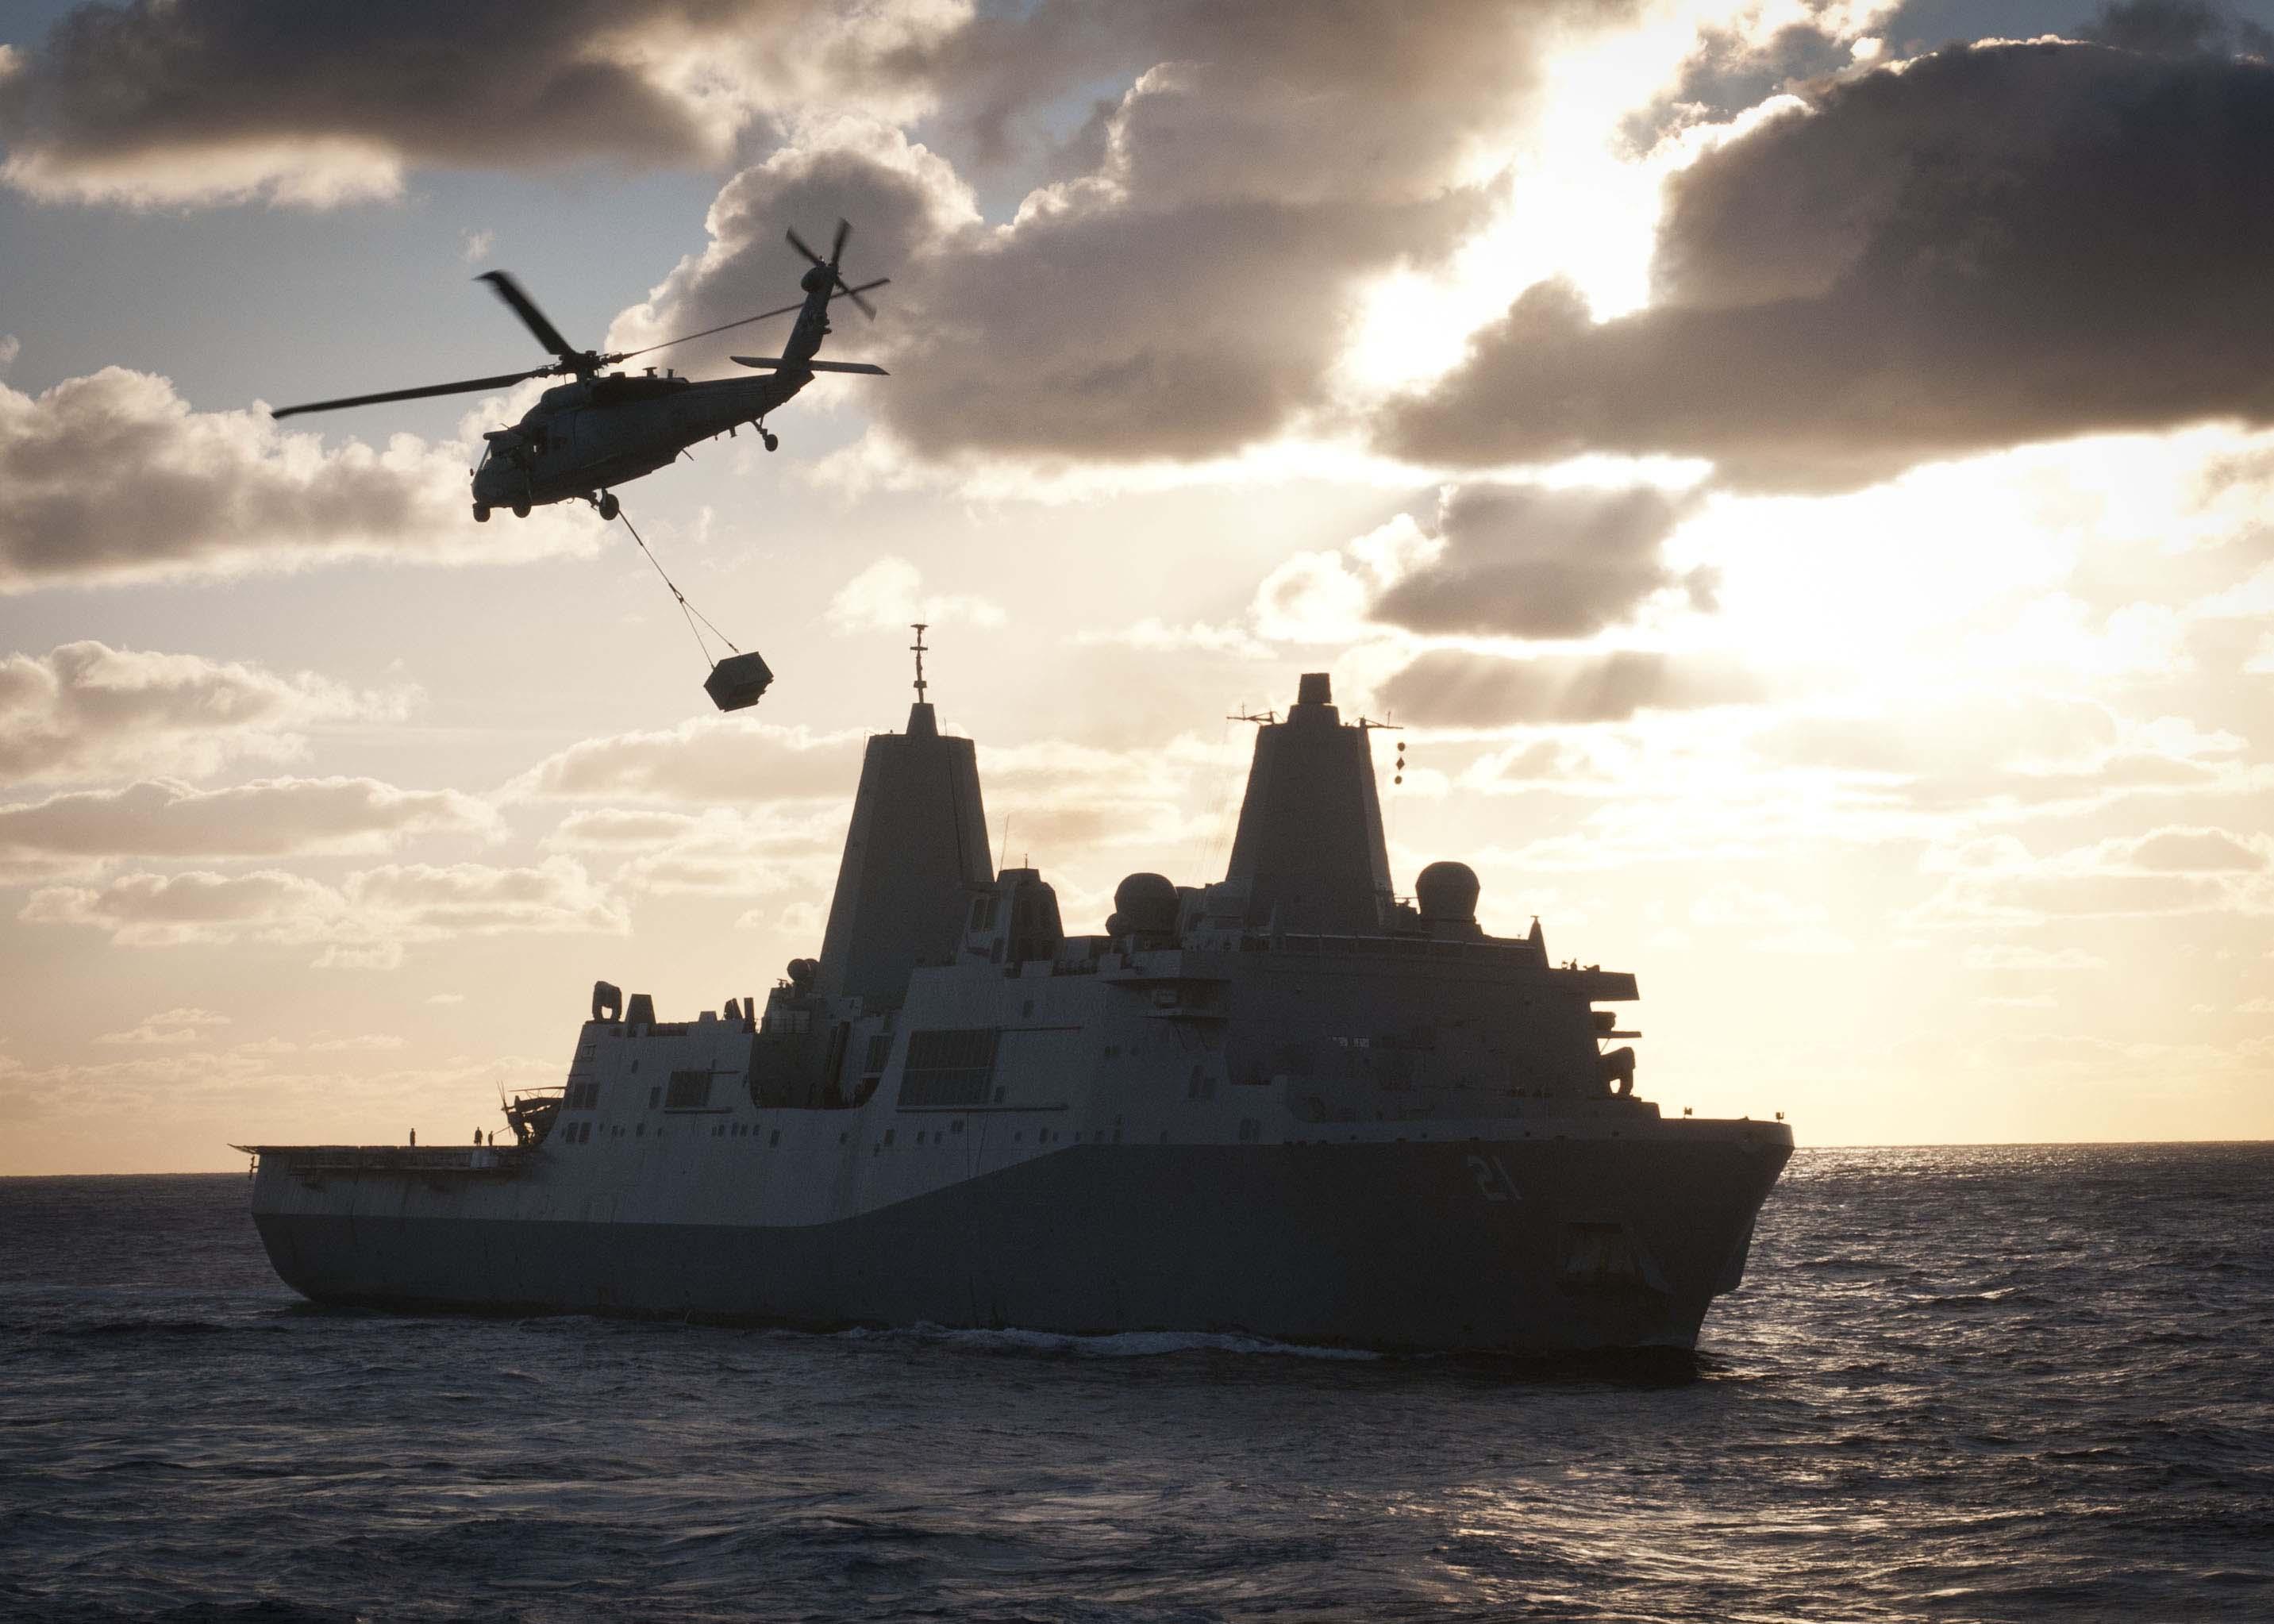 USS New York (LPD-21) in 2012. US Navy Photo